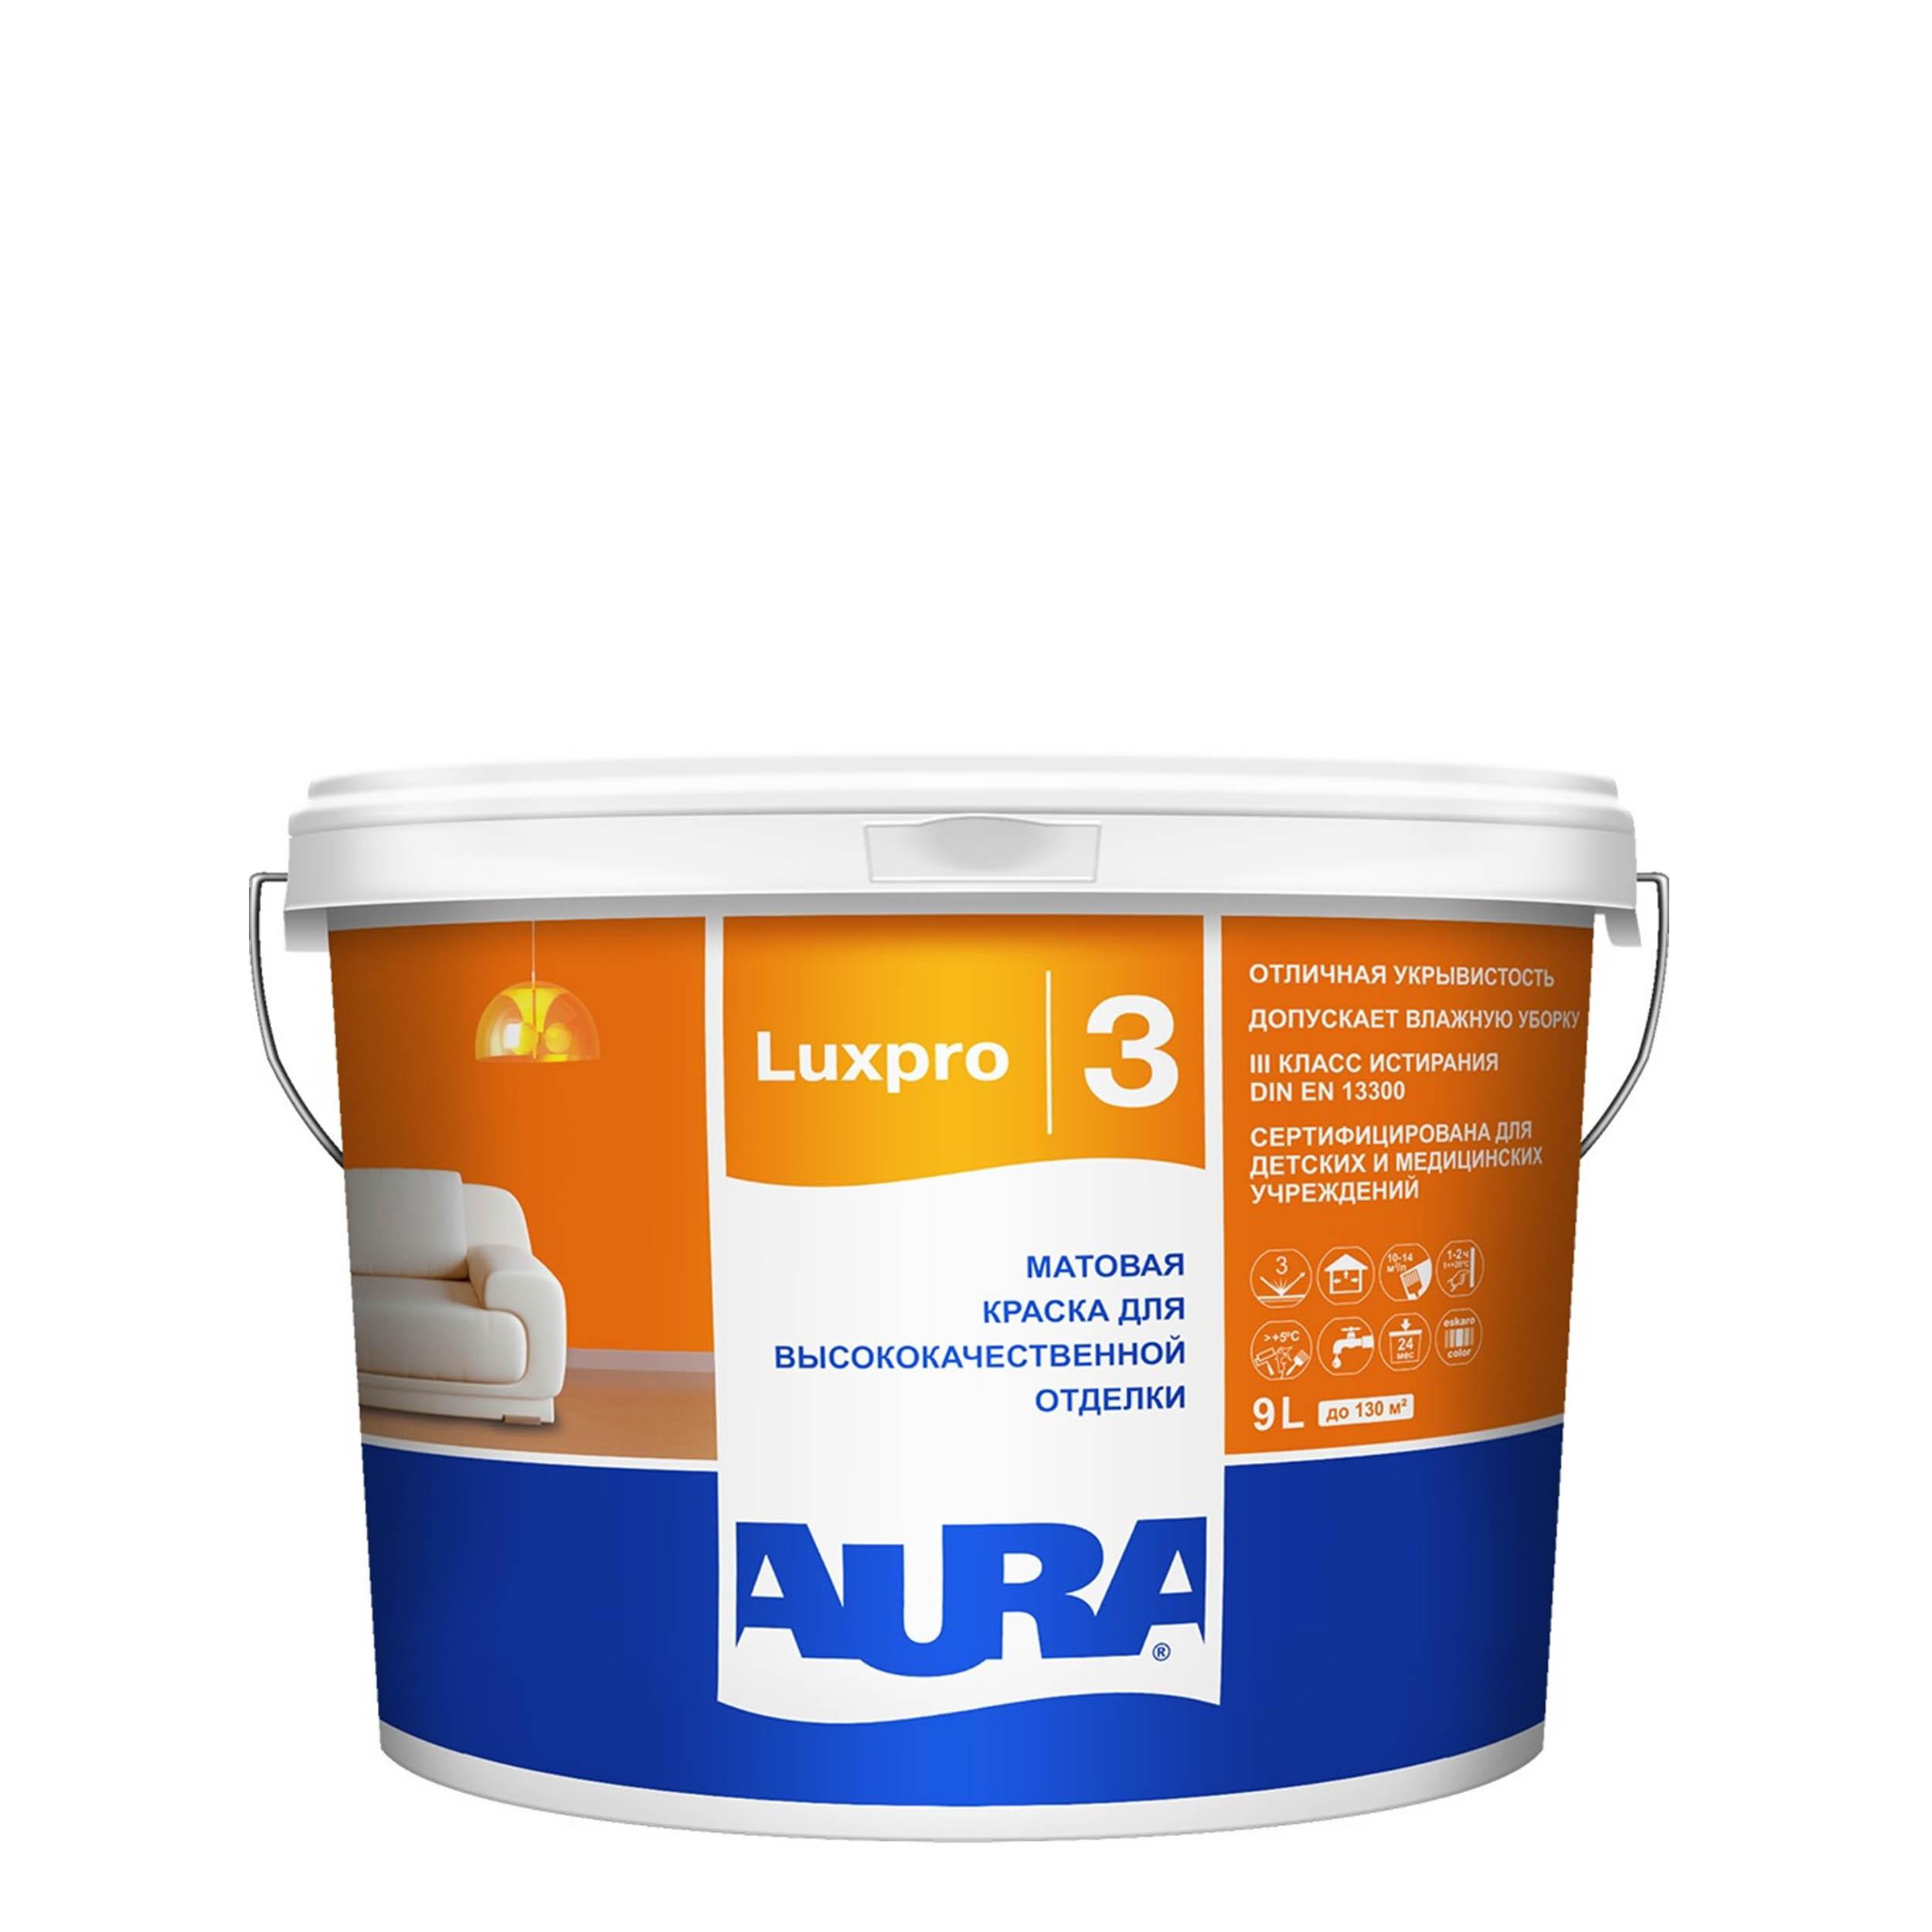 Фото 3 - Краска интерьерная, Aura LuxPRO 3, RAL 5013, 11 кг.